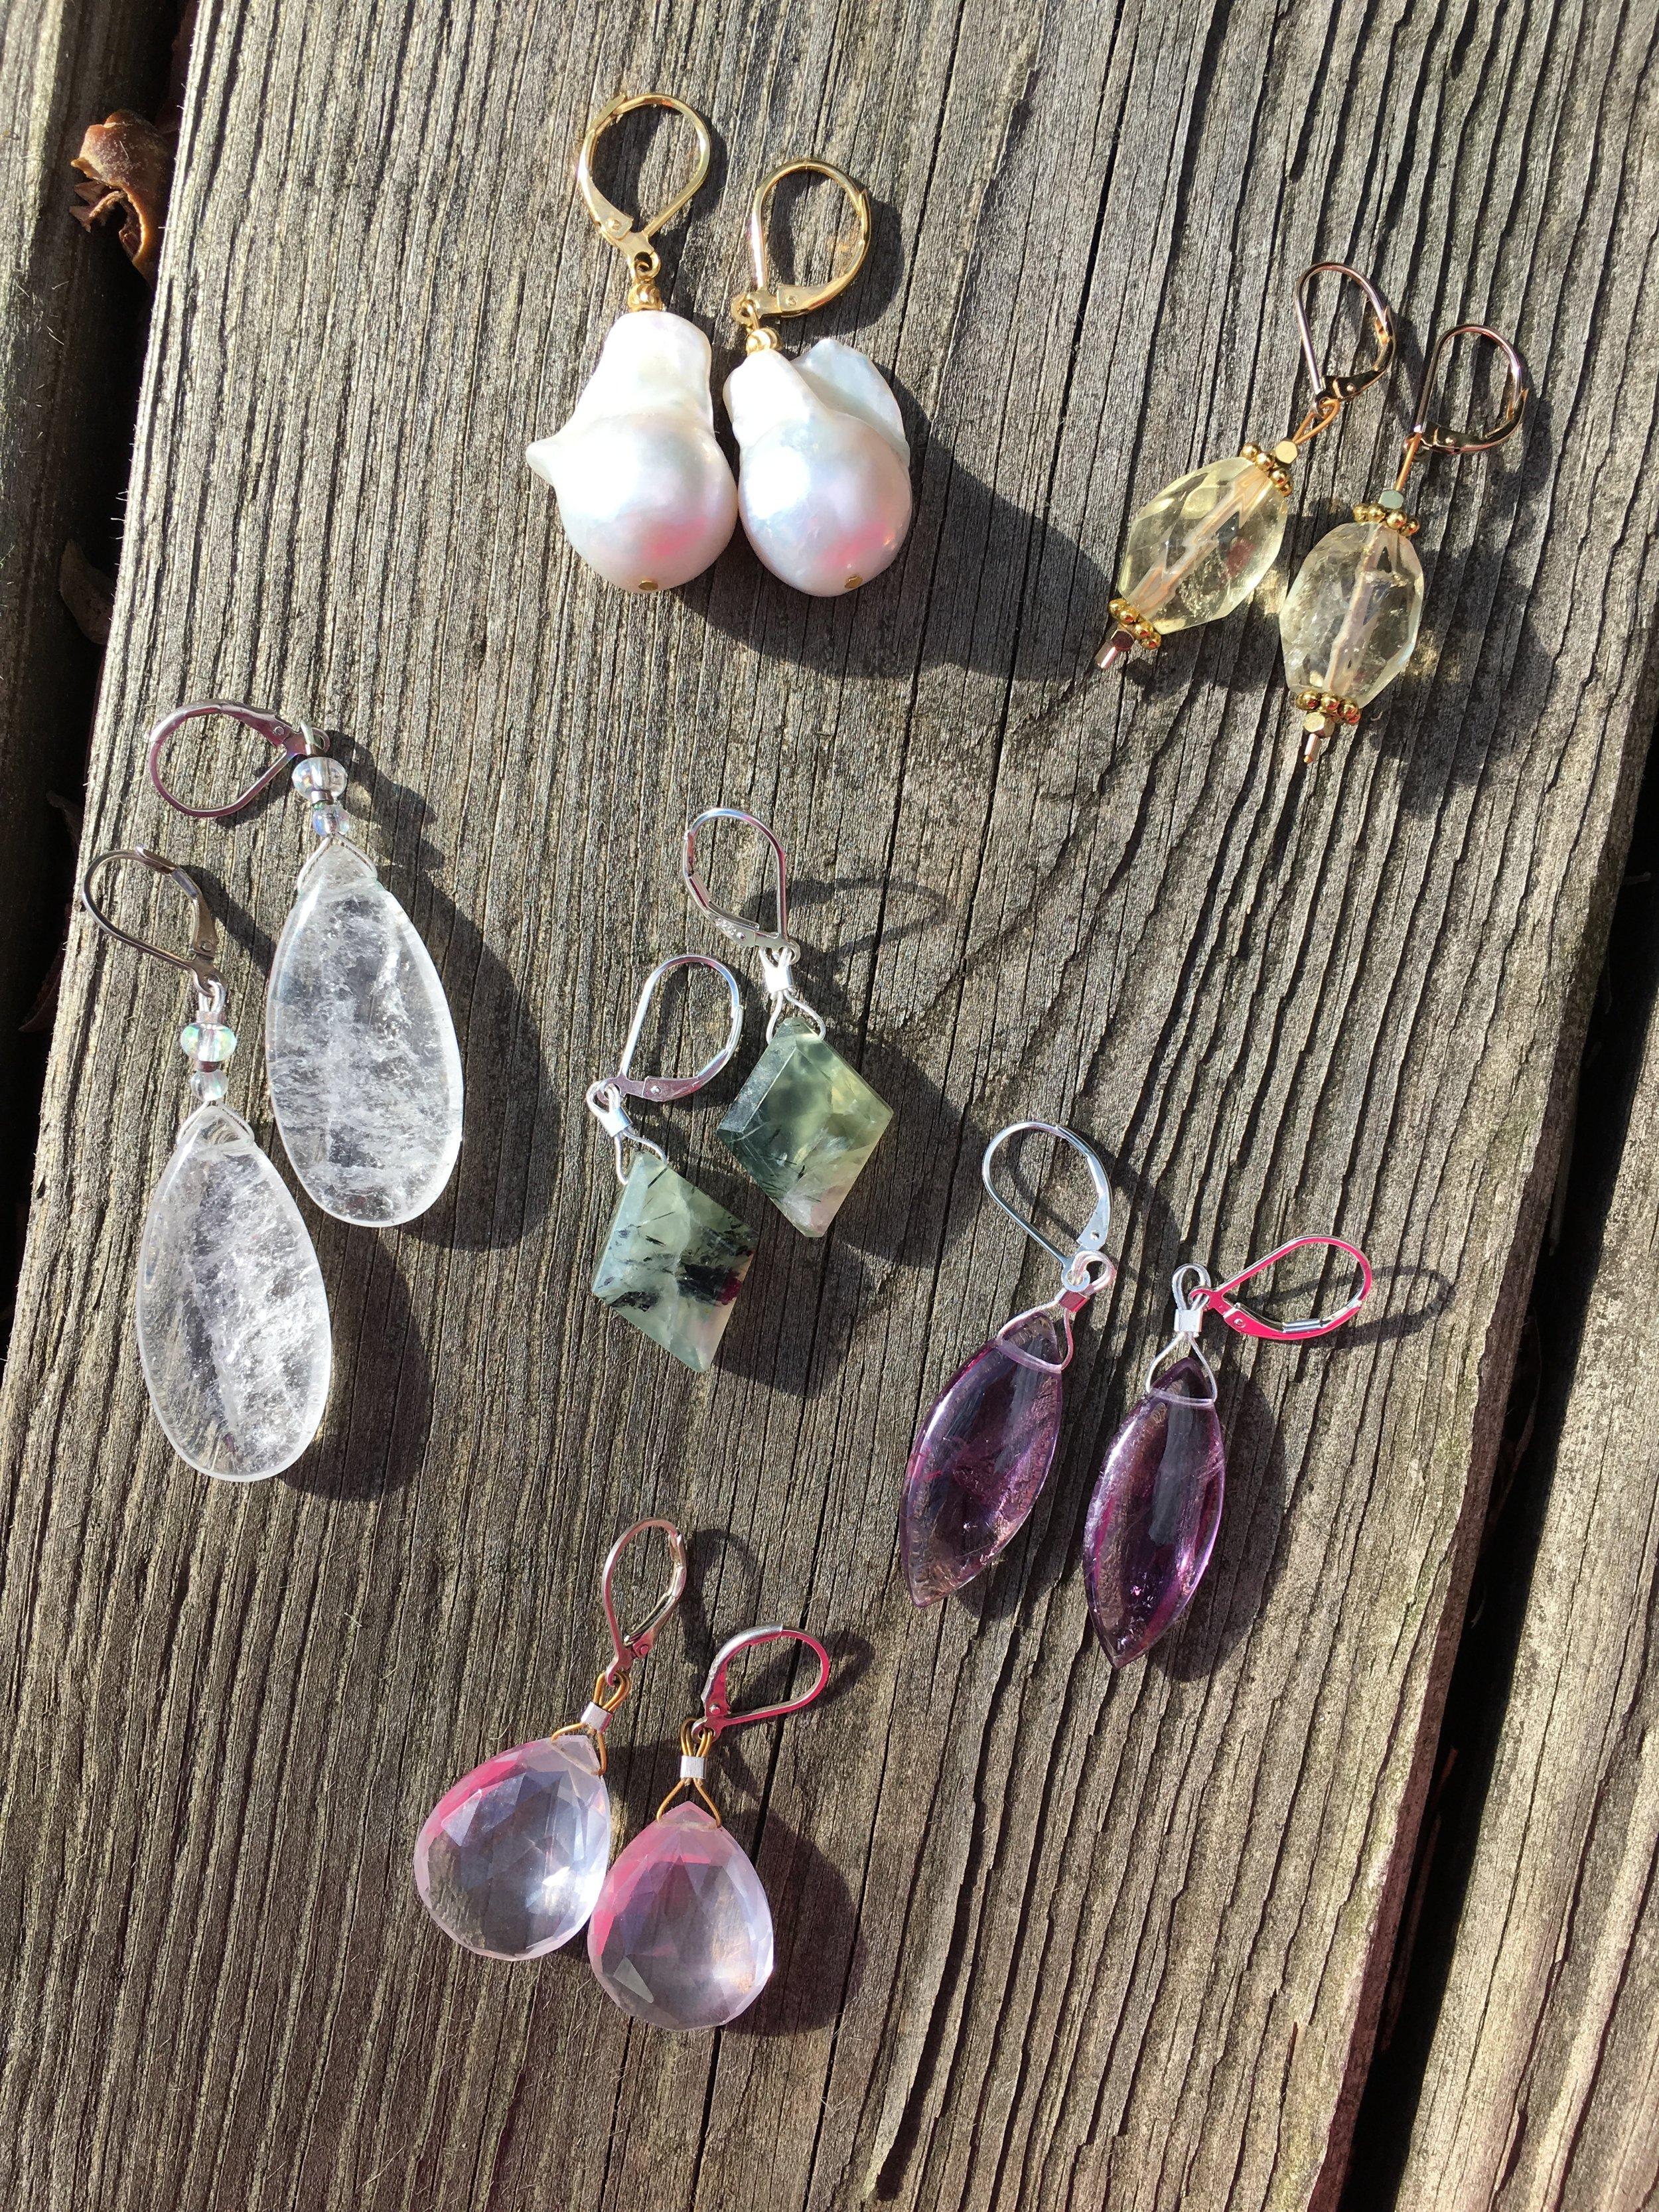 earrings  Baroque pearl $200 Citrine $40 Rutilated Quartz $40 Prehnite $40 Amethyst $40 Rose Quartz $75